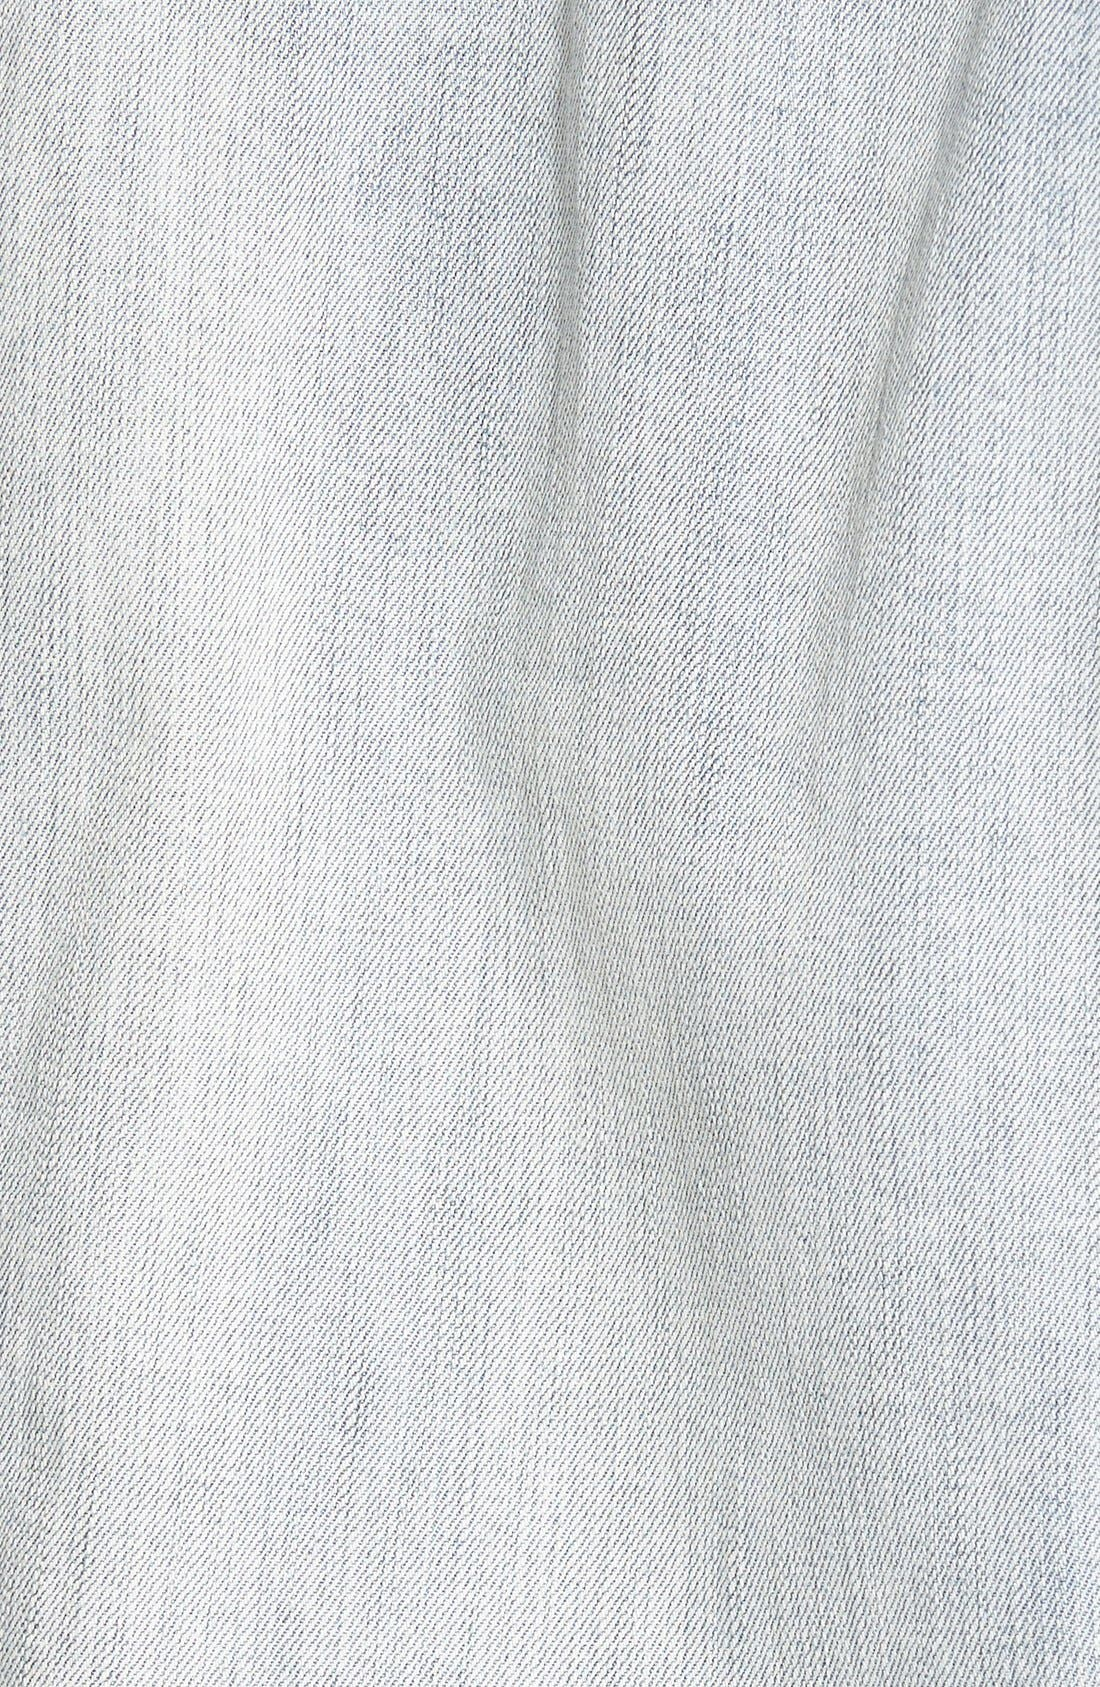 'Helena' Denim Jacket,                             Alternate thumbnail 3, color,                             SWEET